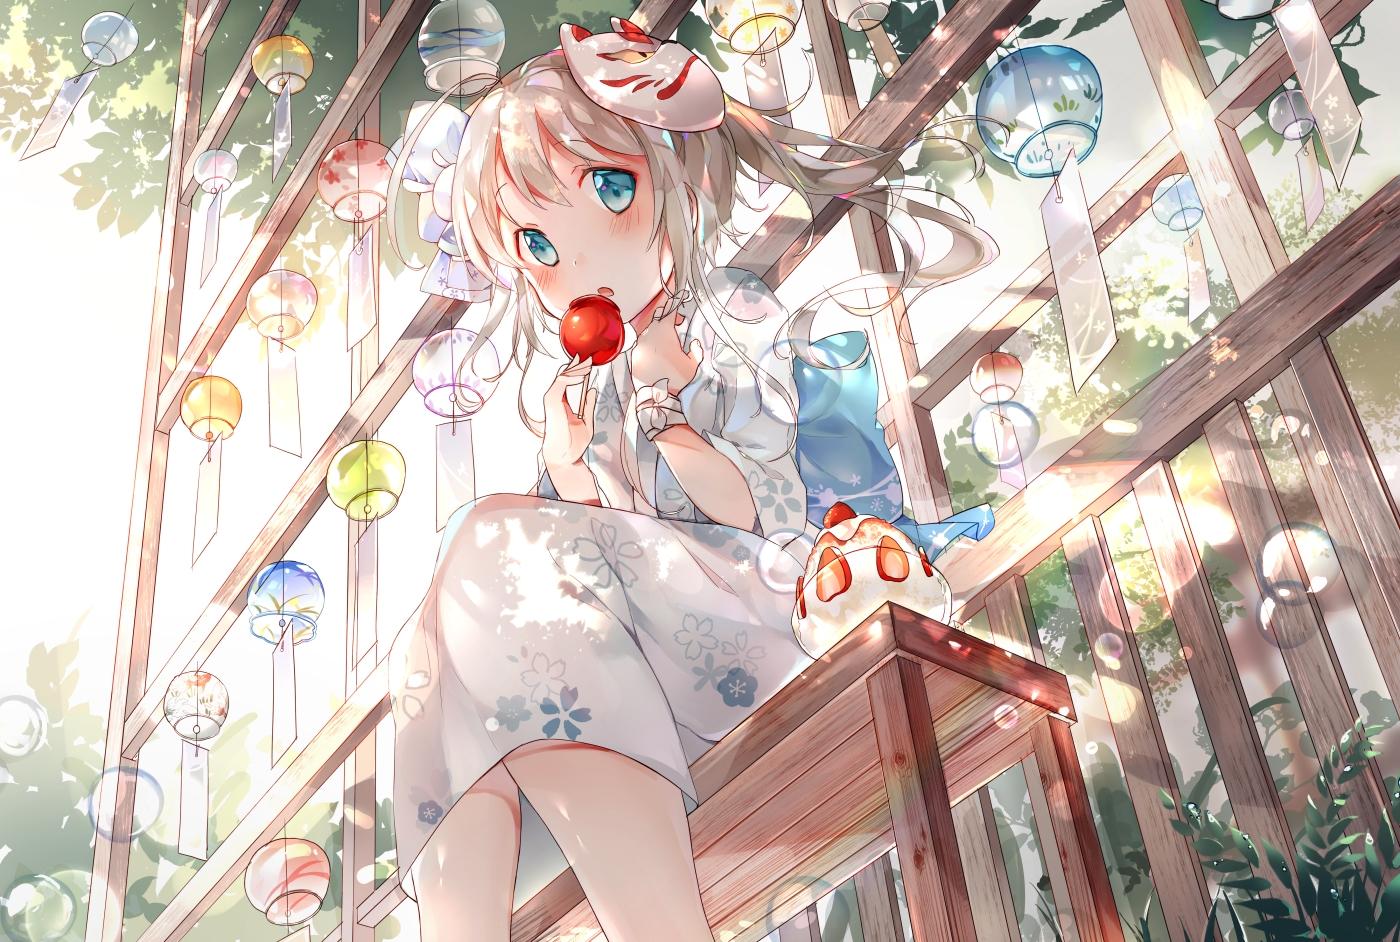 aliasing amafuyu apple blonde_hair blush bubbles candy food fruit green_eyes japanese_clothes loli mask original ponytail strawberry wristwear yukata